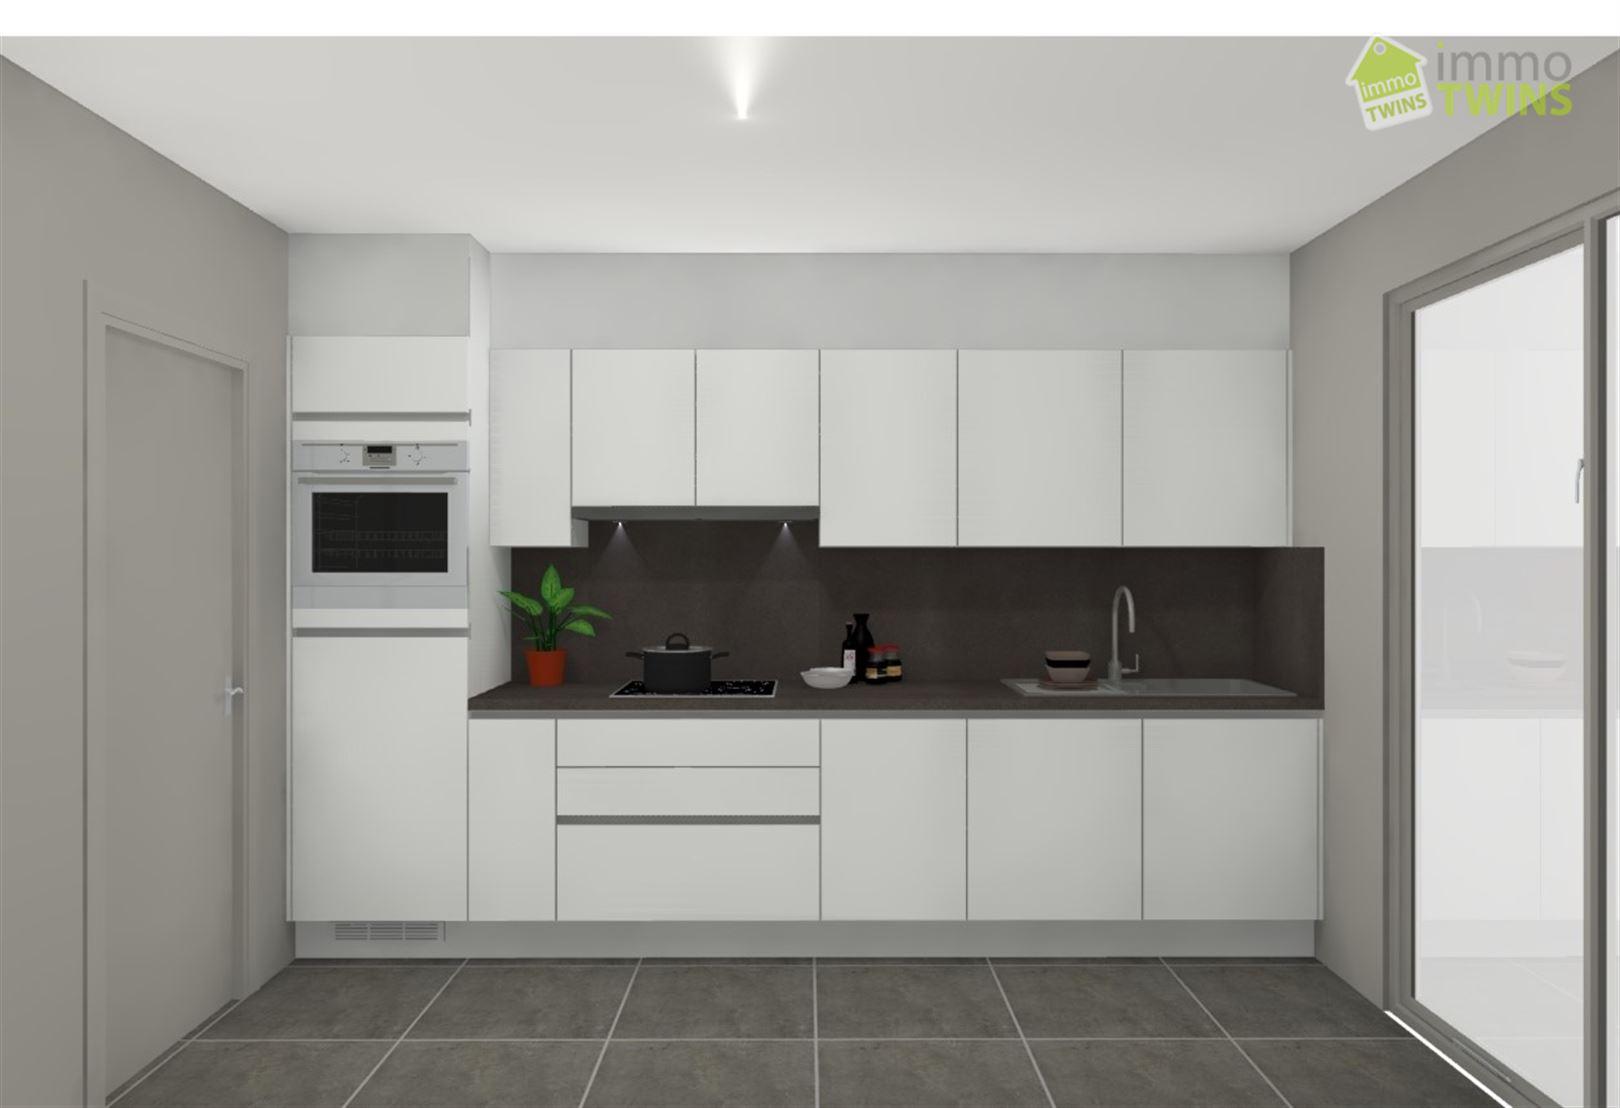 Foto 3 : Appartement te 9200 DENDERMONDE (België) - Prijs € 600